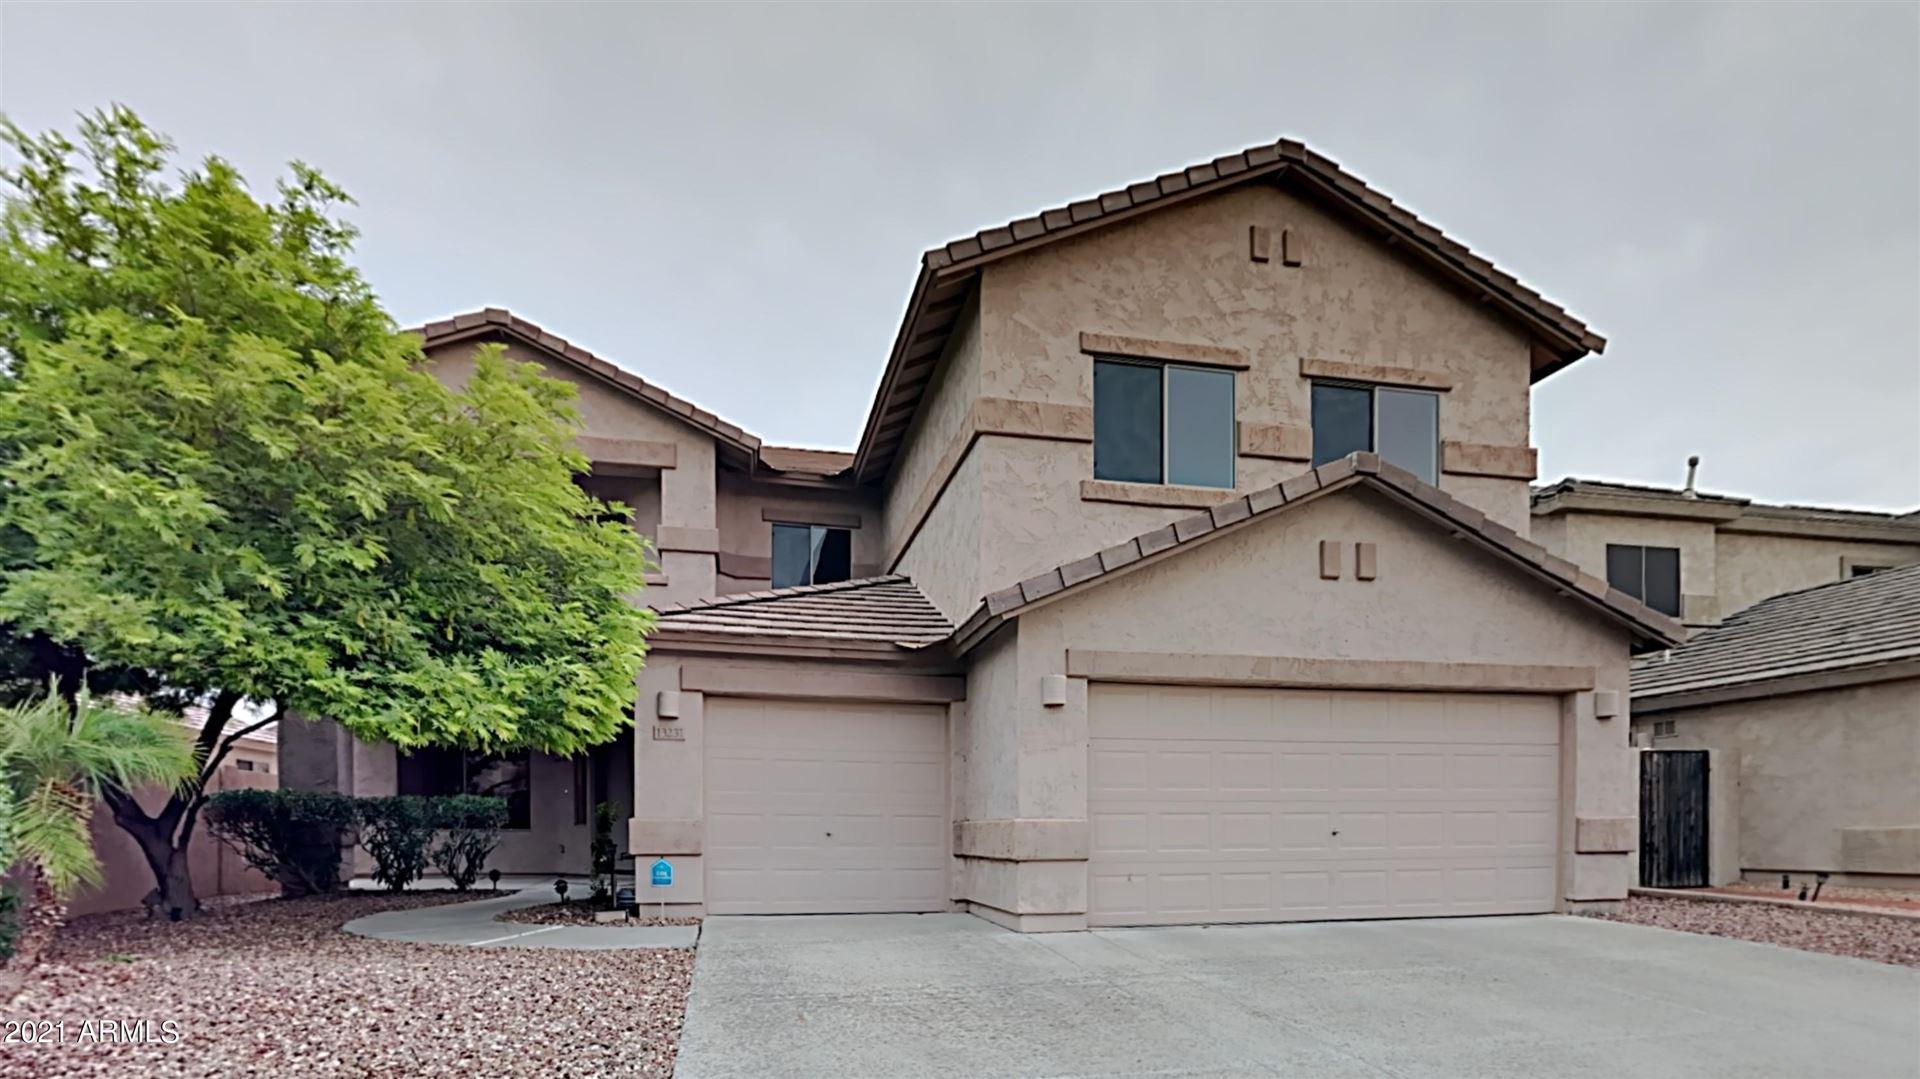 Photo of 13231 W STELLA Lane, Litchfield Park, AZ 85340 (MLS # 6270592)